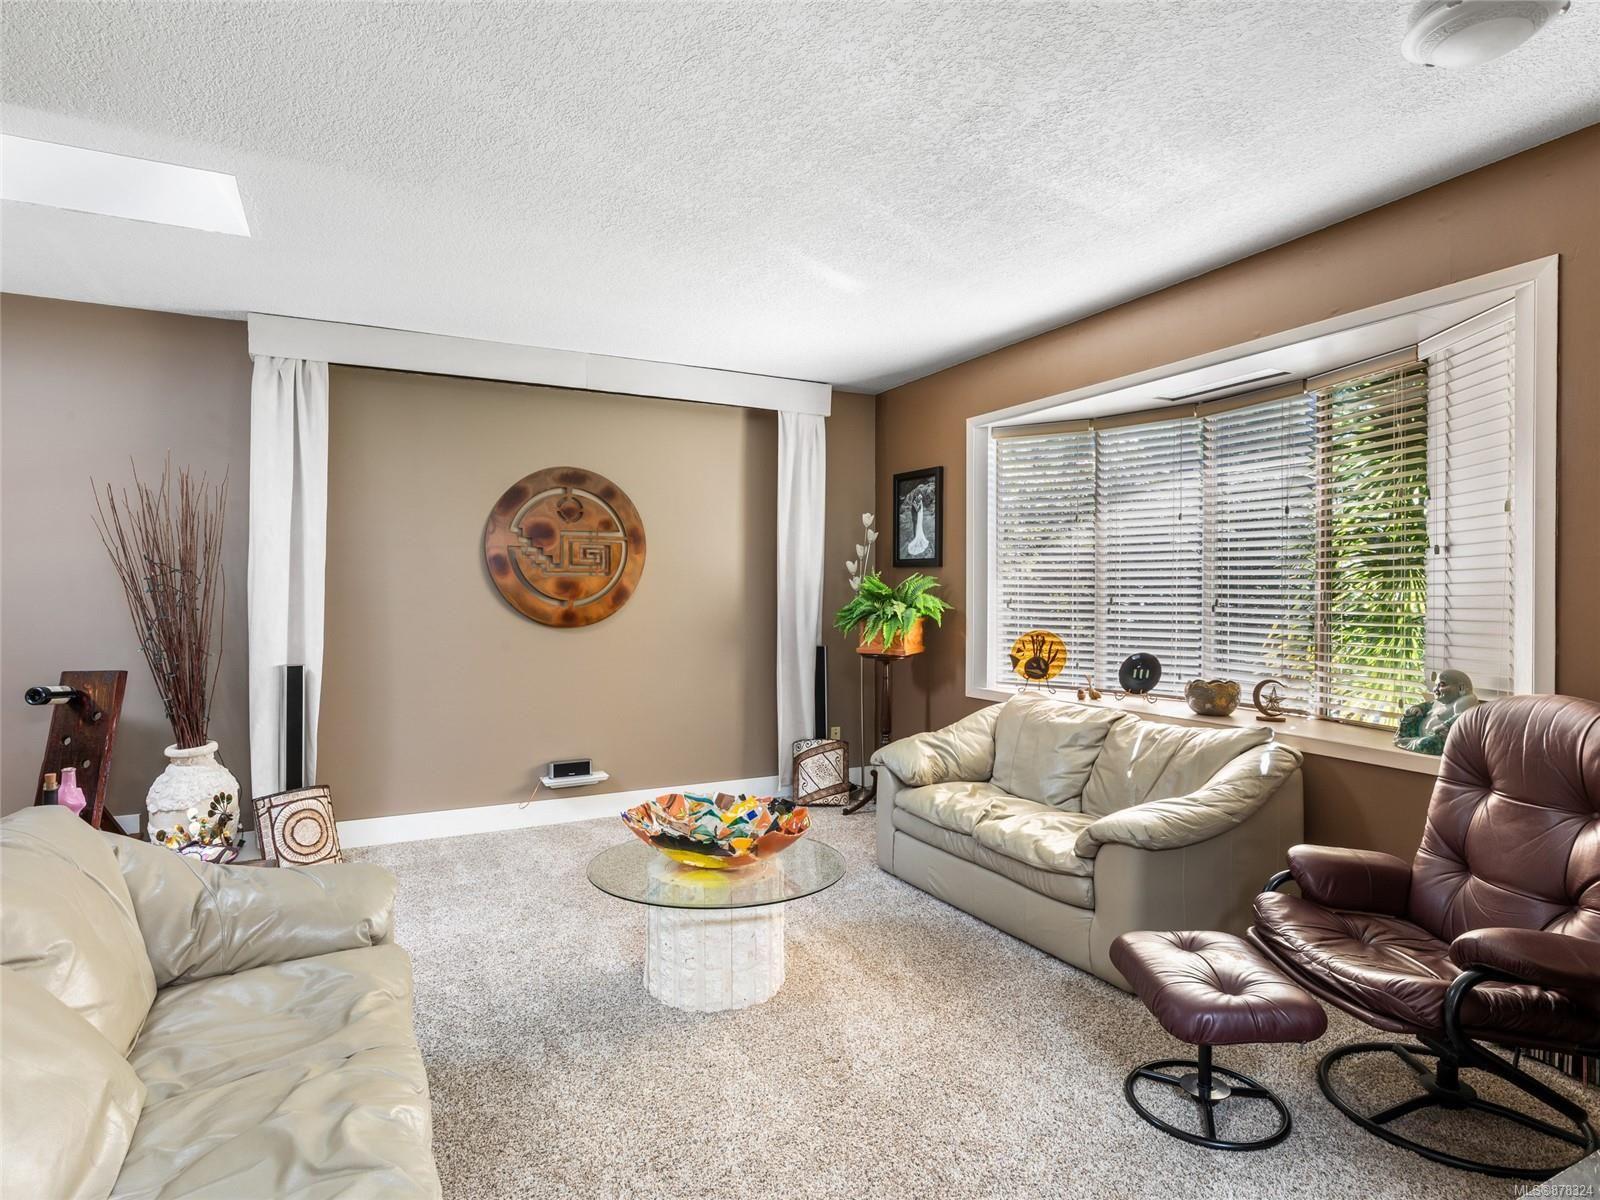 Photo 17: Photos: 3875 Moore Rd in : PA Port Alberni House for sale (Port Alberni)  : MLS®# 878324